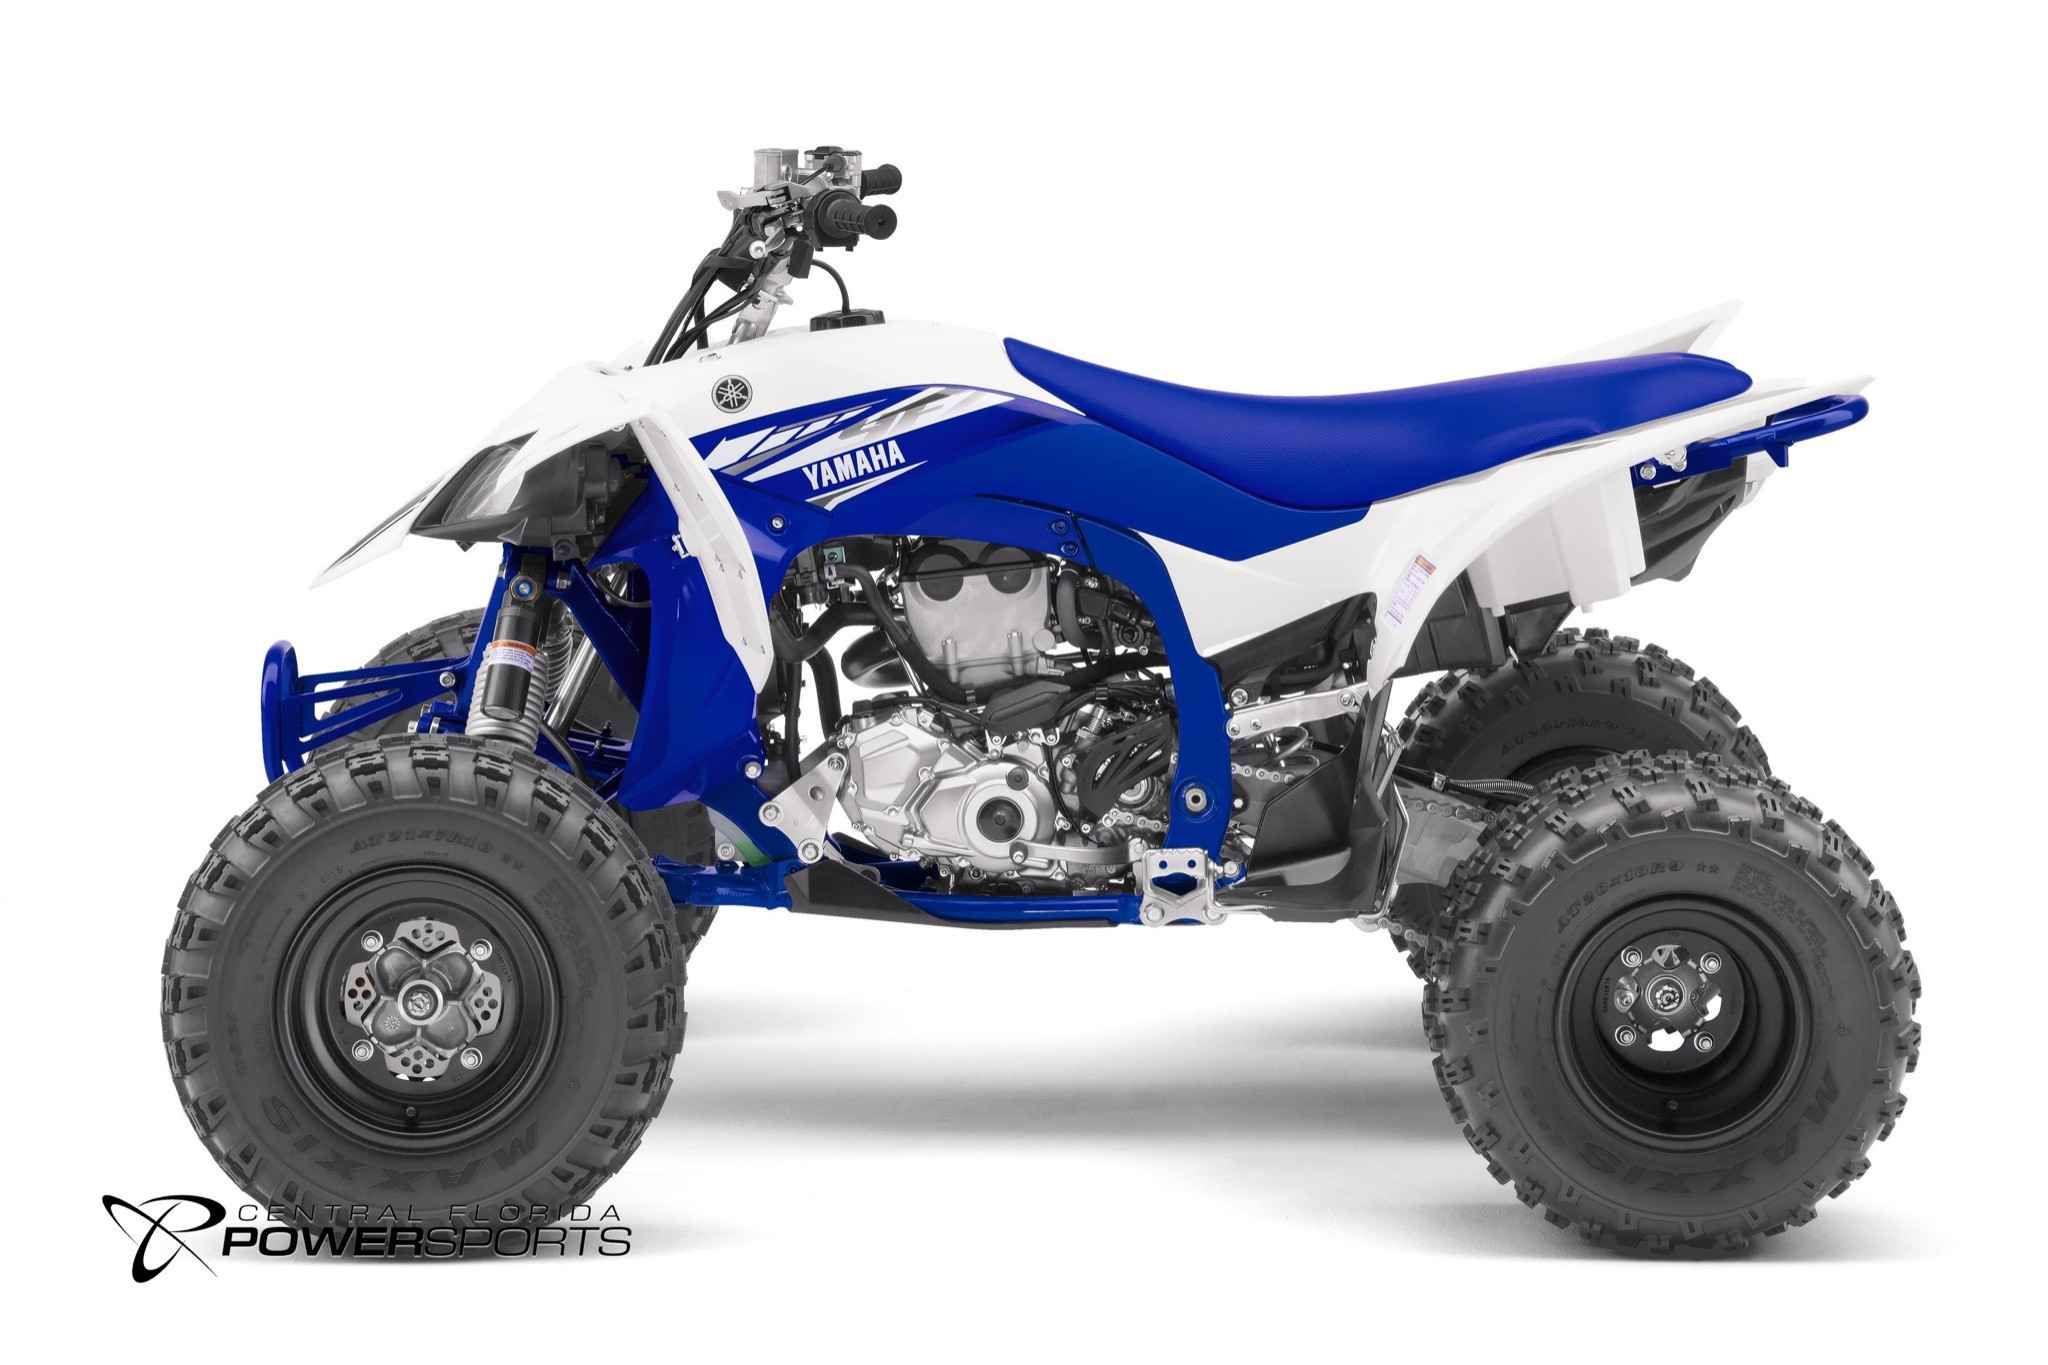 New 2017 Yamaha Yfz450r Atvs For Sale In Florida 2017 Yamaha Yfz450r The 2017 Yamaha Yfz450r Track Trail And Podium Ready The Most Tech Yamaha Atv Sport Atv